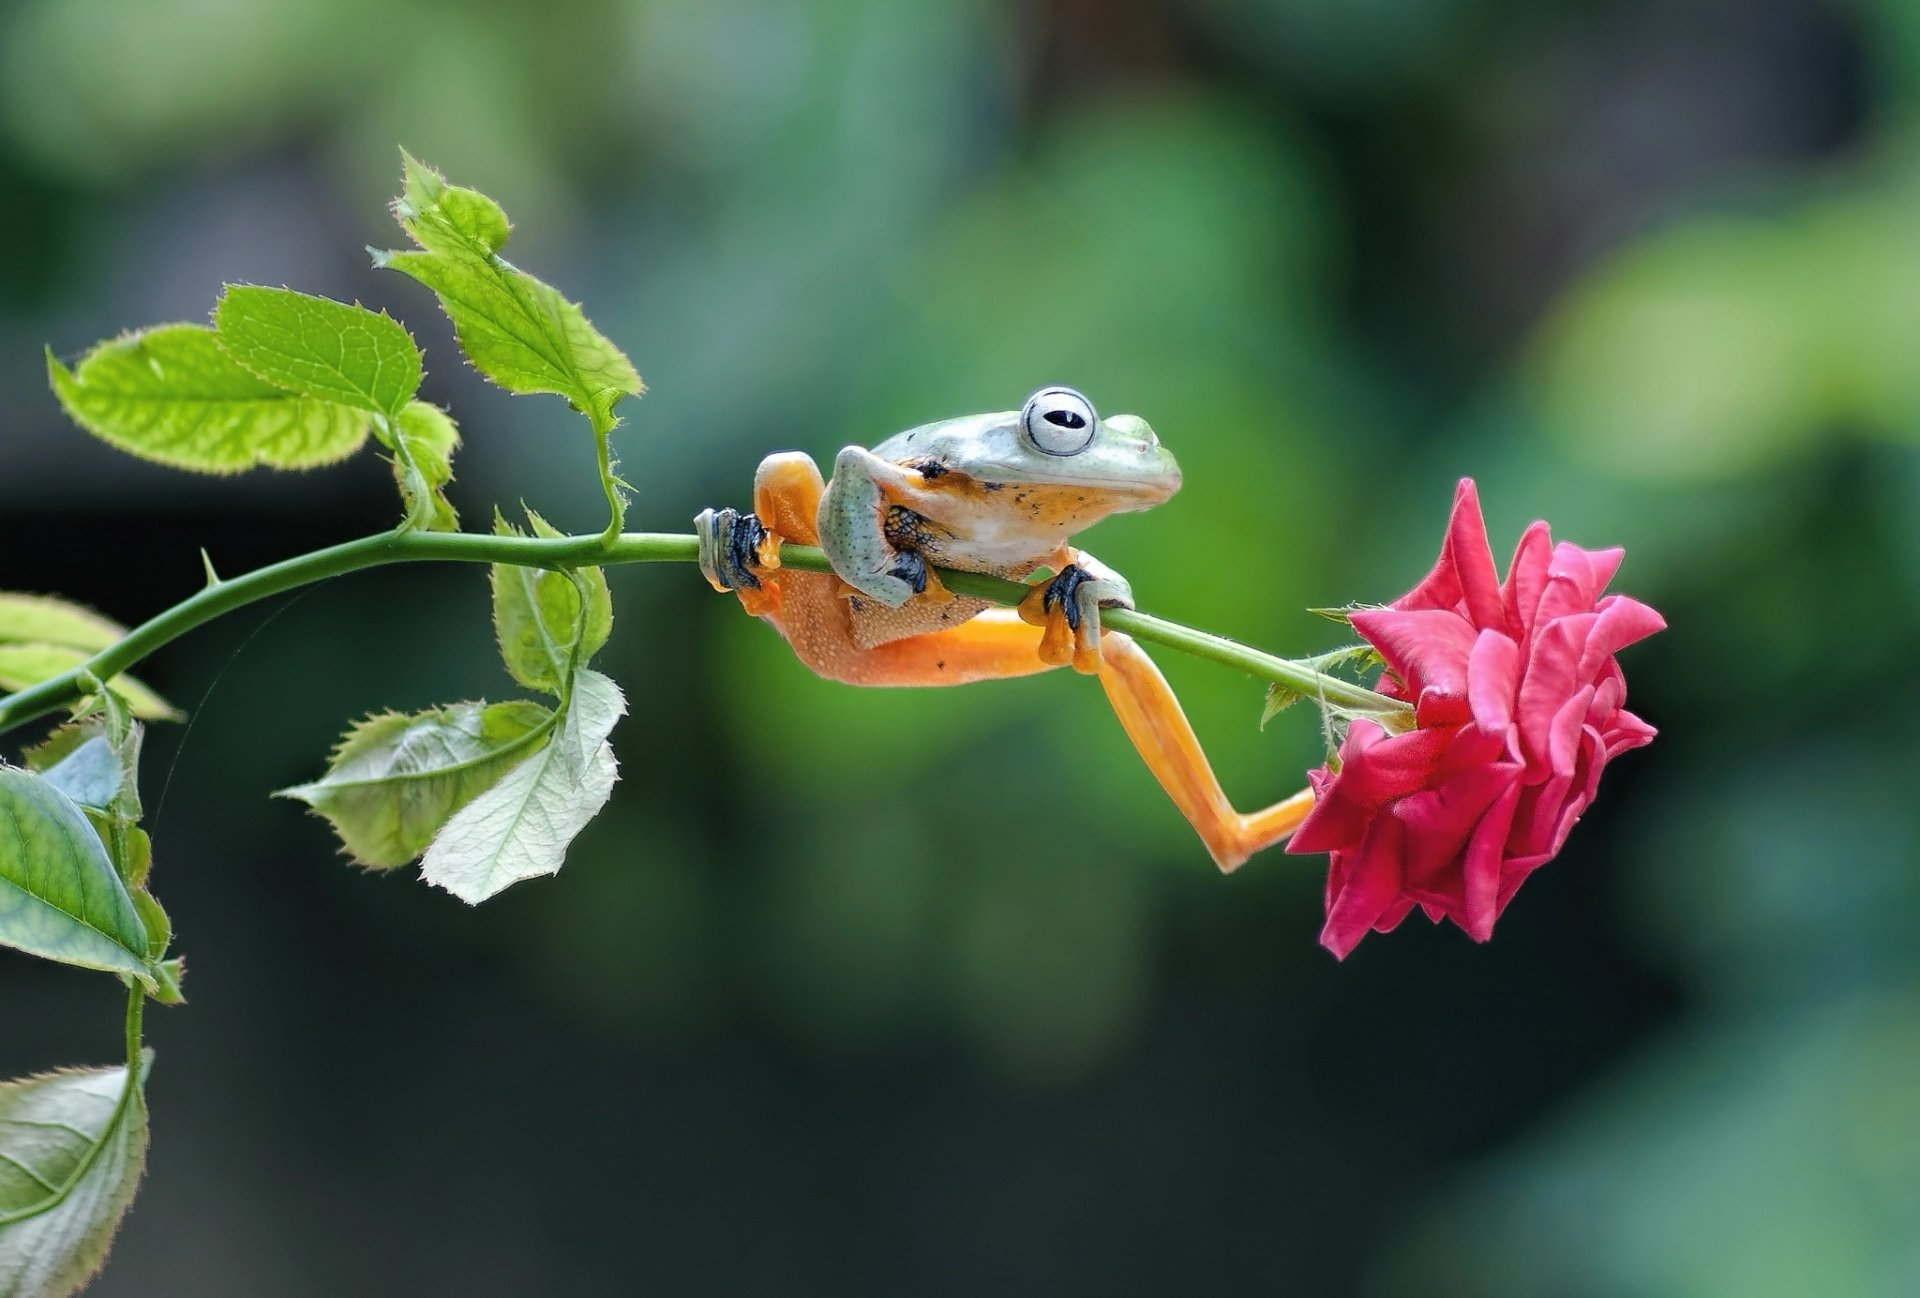 Djur - Groda  Amphibian Wildlife Depth Of Field Rose Bakgrund